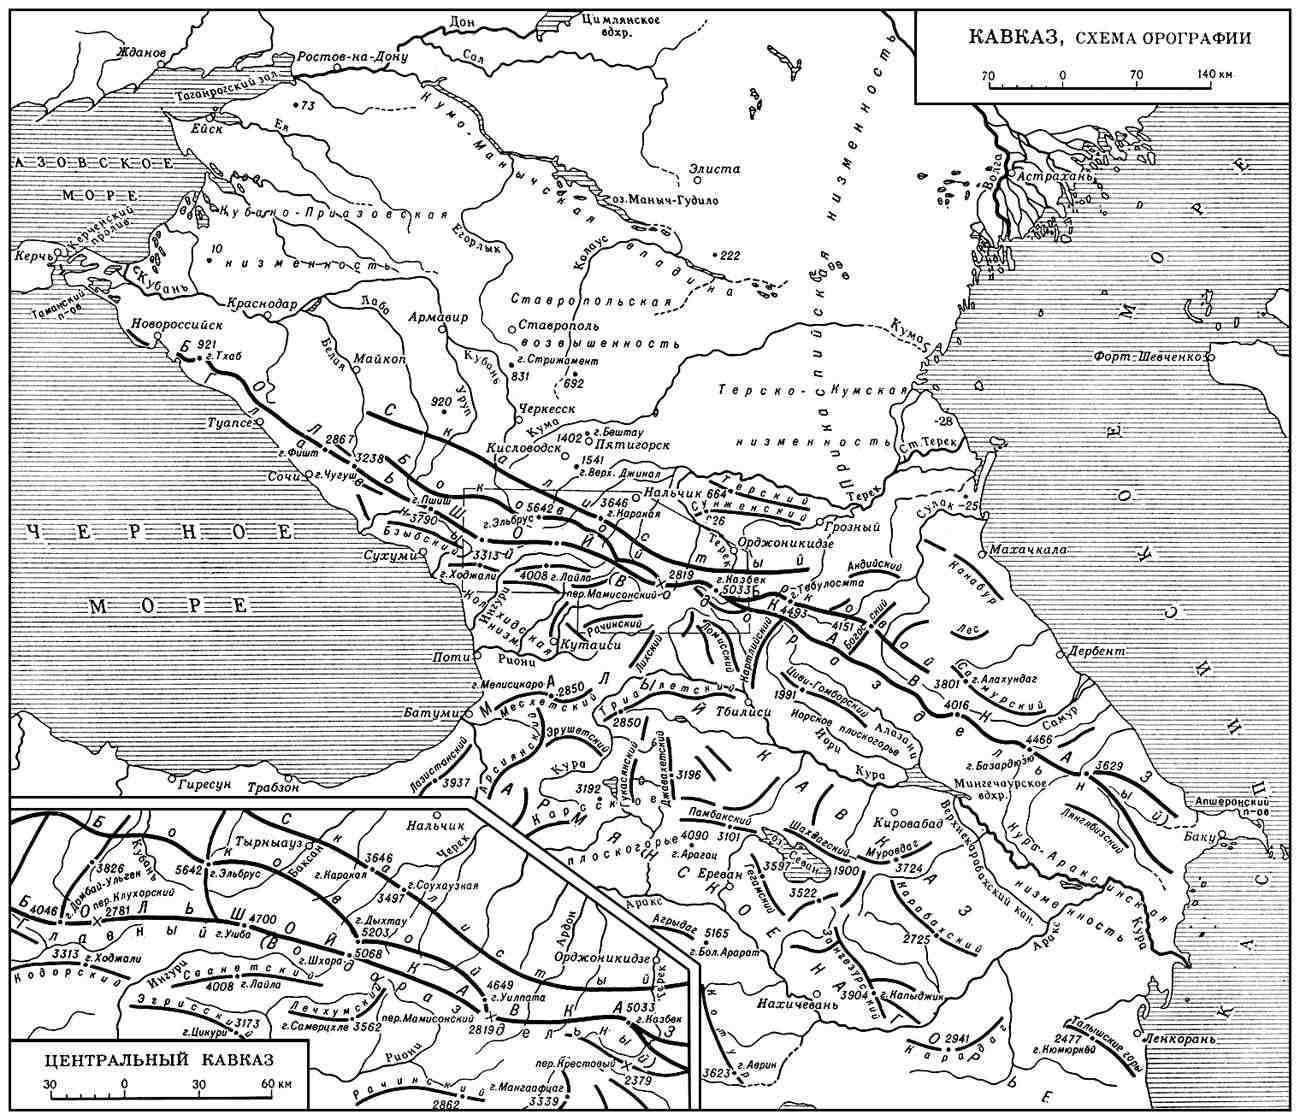 Кавказ.  Схема орографии.